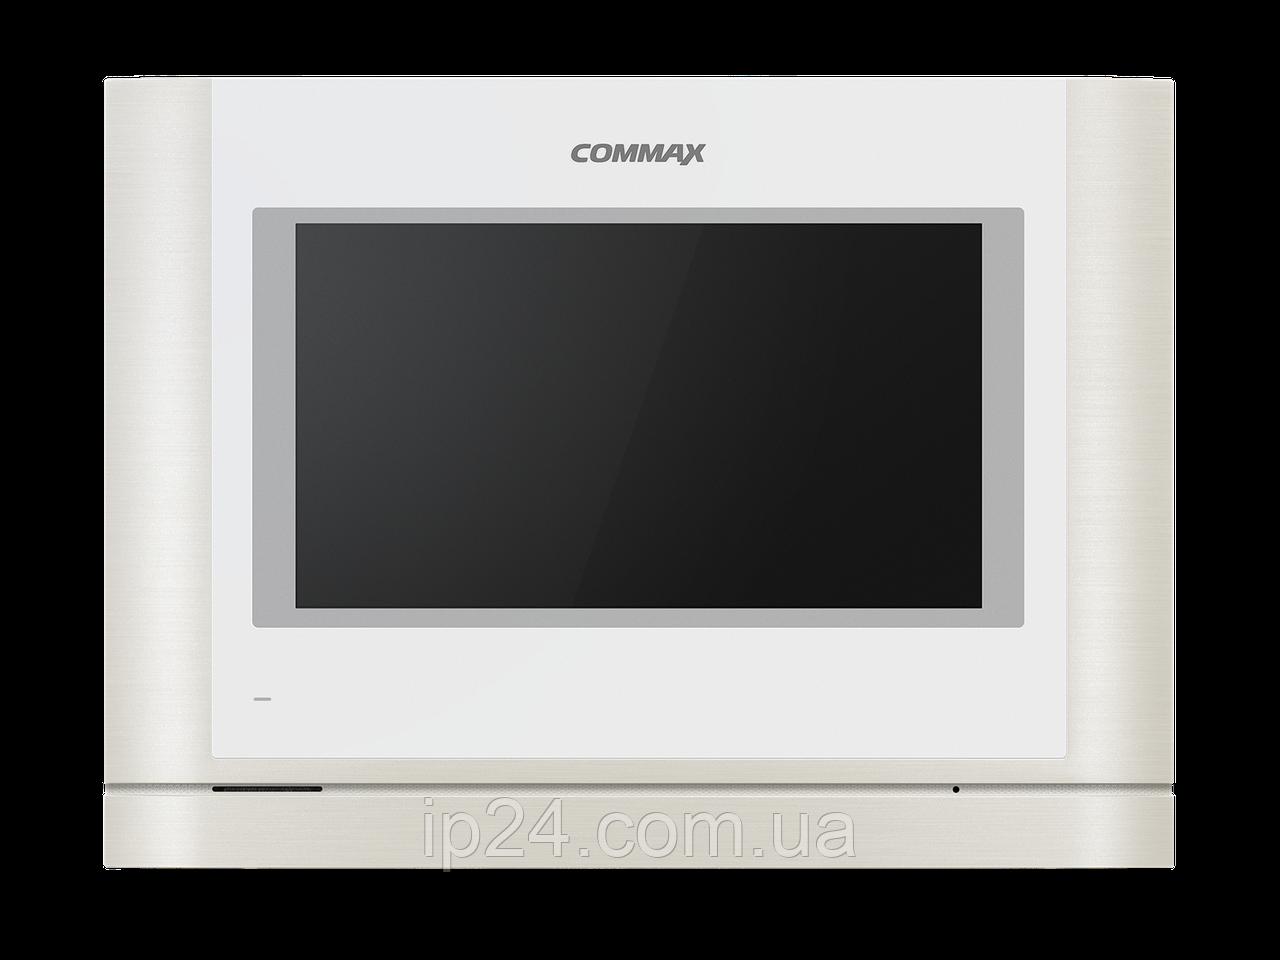 Commax CDV-704MF видеодомофон